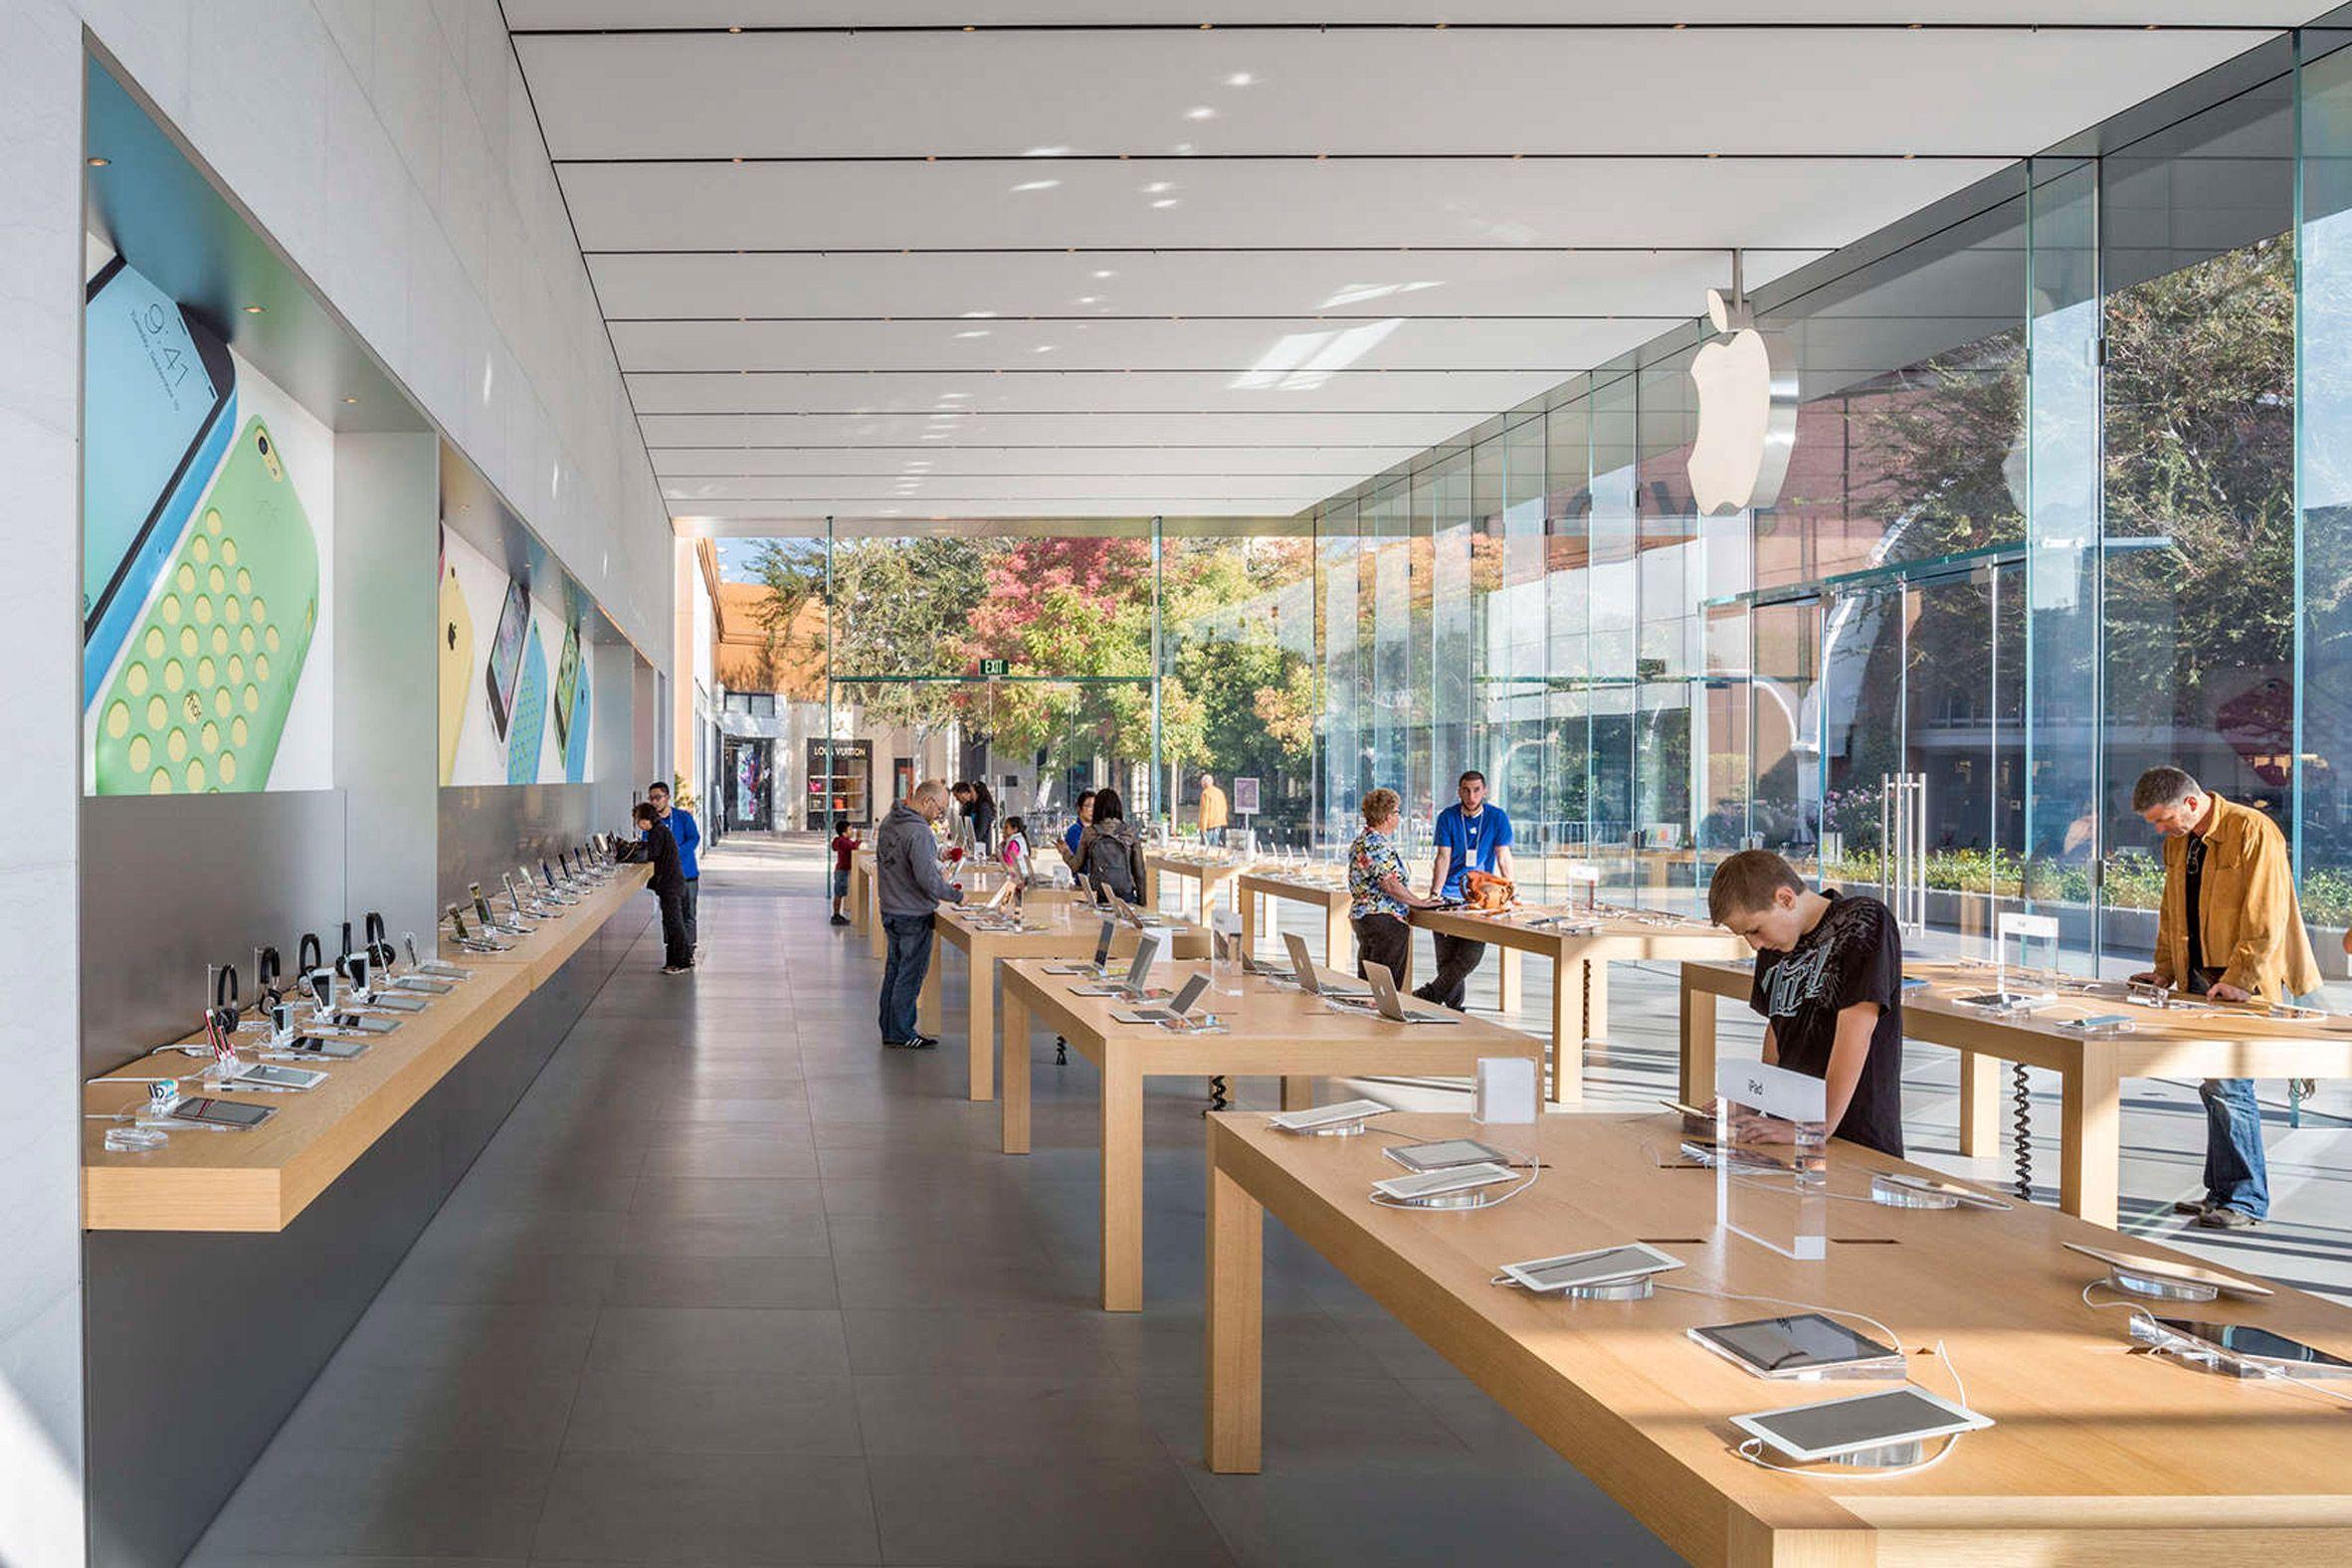 Apple Store Stanford By Bohlin Cywinski Jackson Apple Store Retail Architecture Apple Retail Store